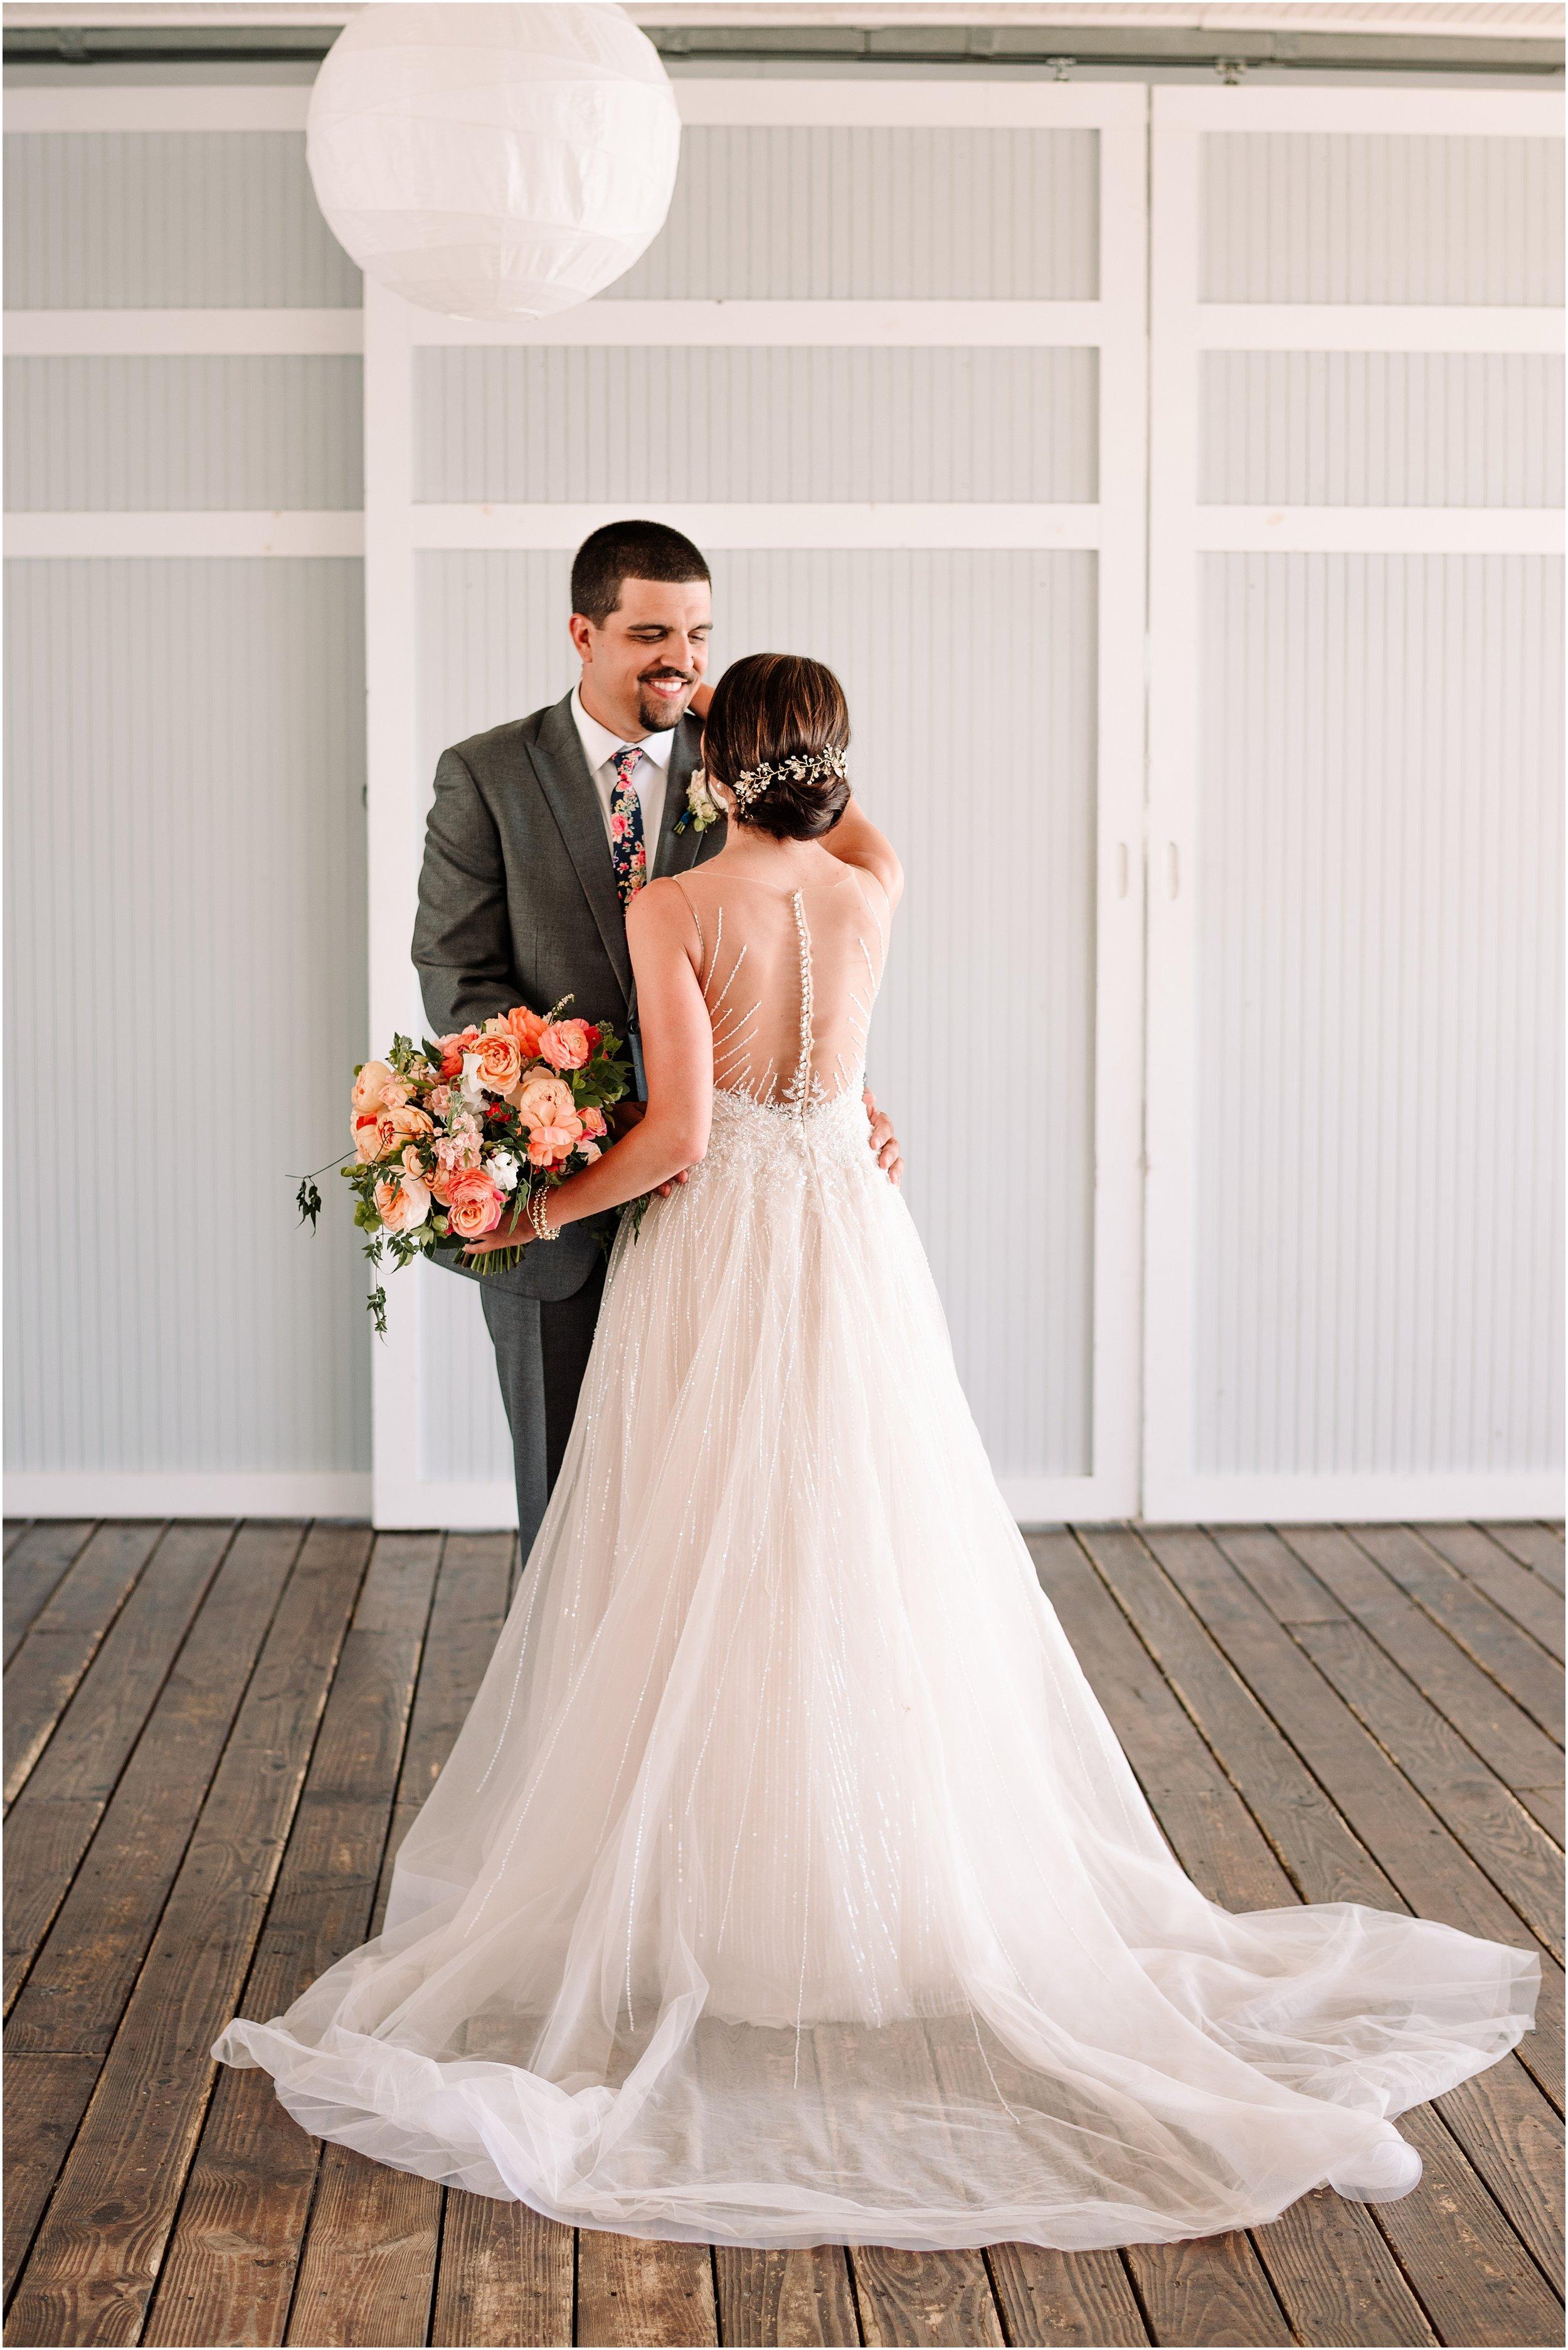 hannah leigh photography chesapeake bay beach club wedding Stevensville MD_3076.jpg